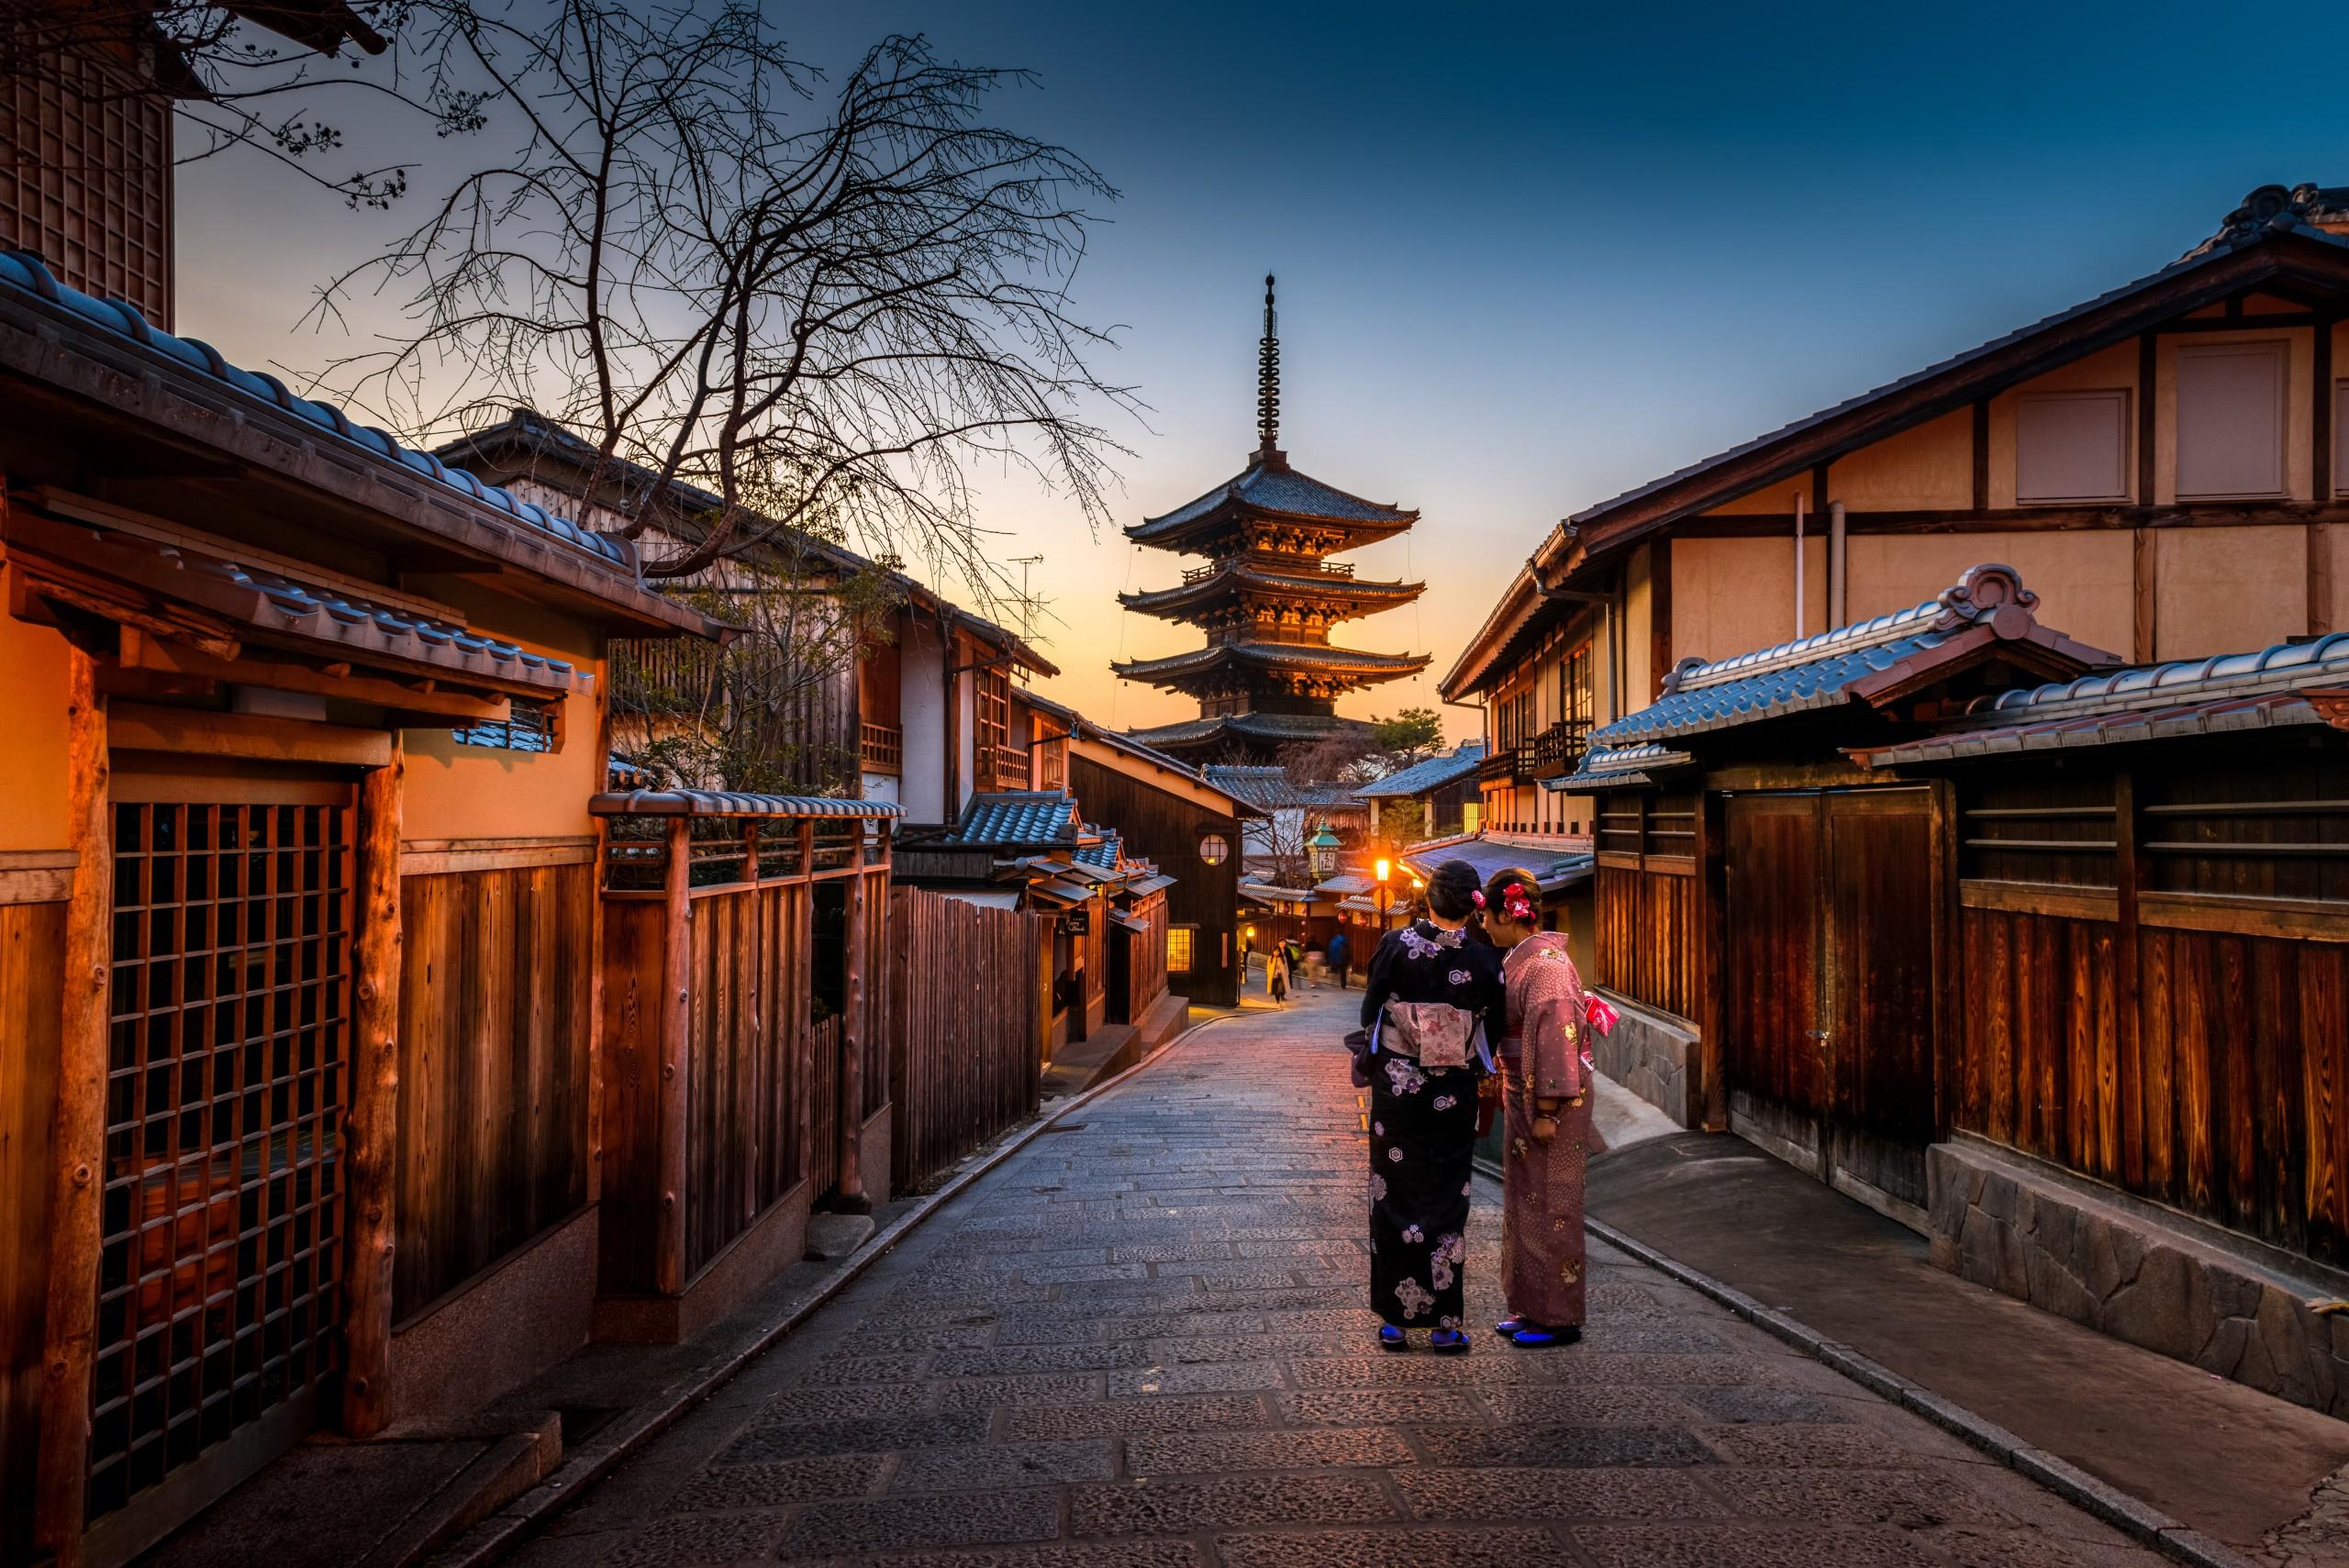 Vol.46<br>東本願寺と共に、文化と人をつなぐ。<br>[尾形浩一朗]